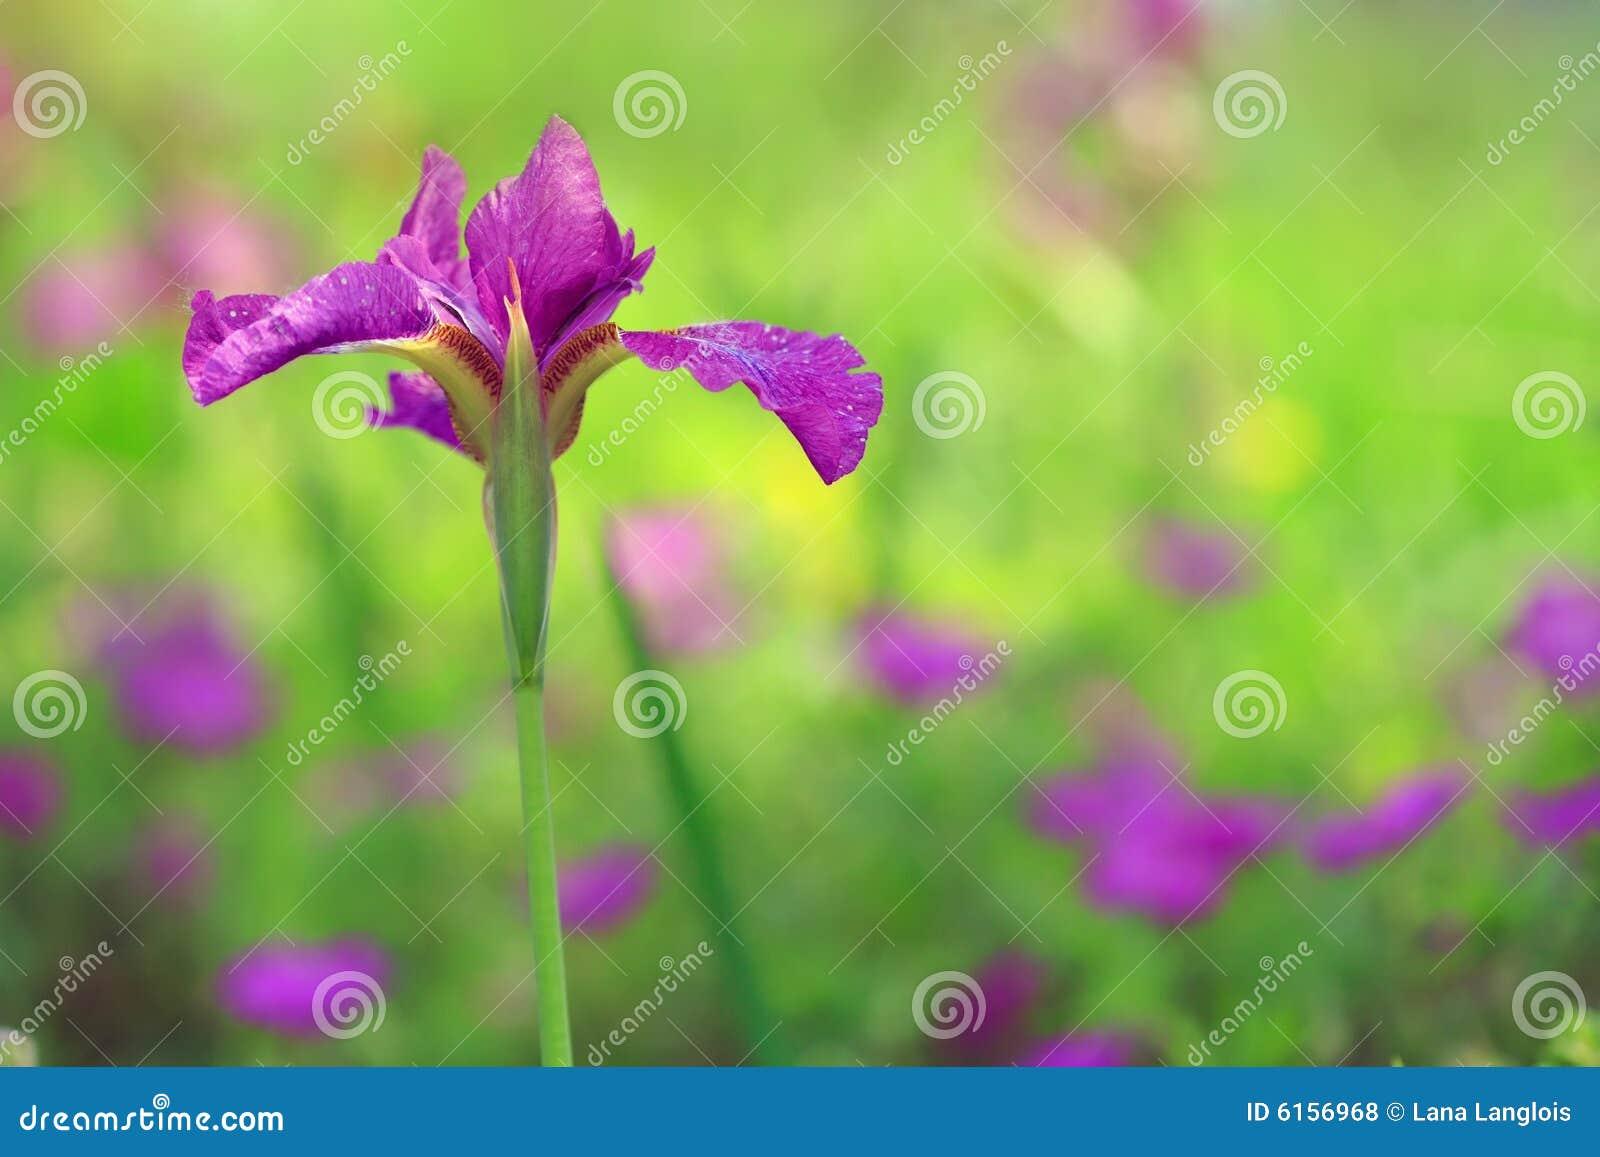 Field Of Iris Flowers Stock Photo Image Of Purple Fresh 6156968